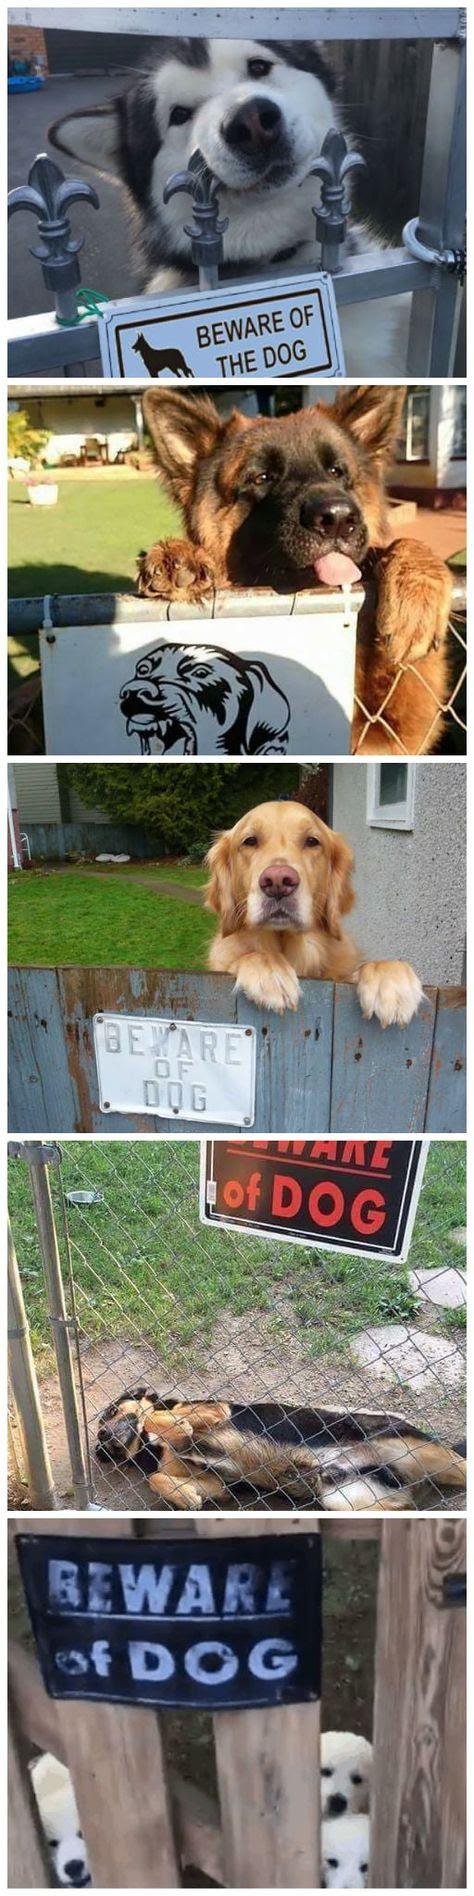 the dog... - meme